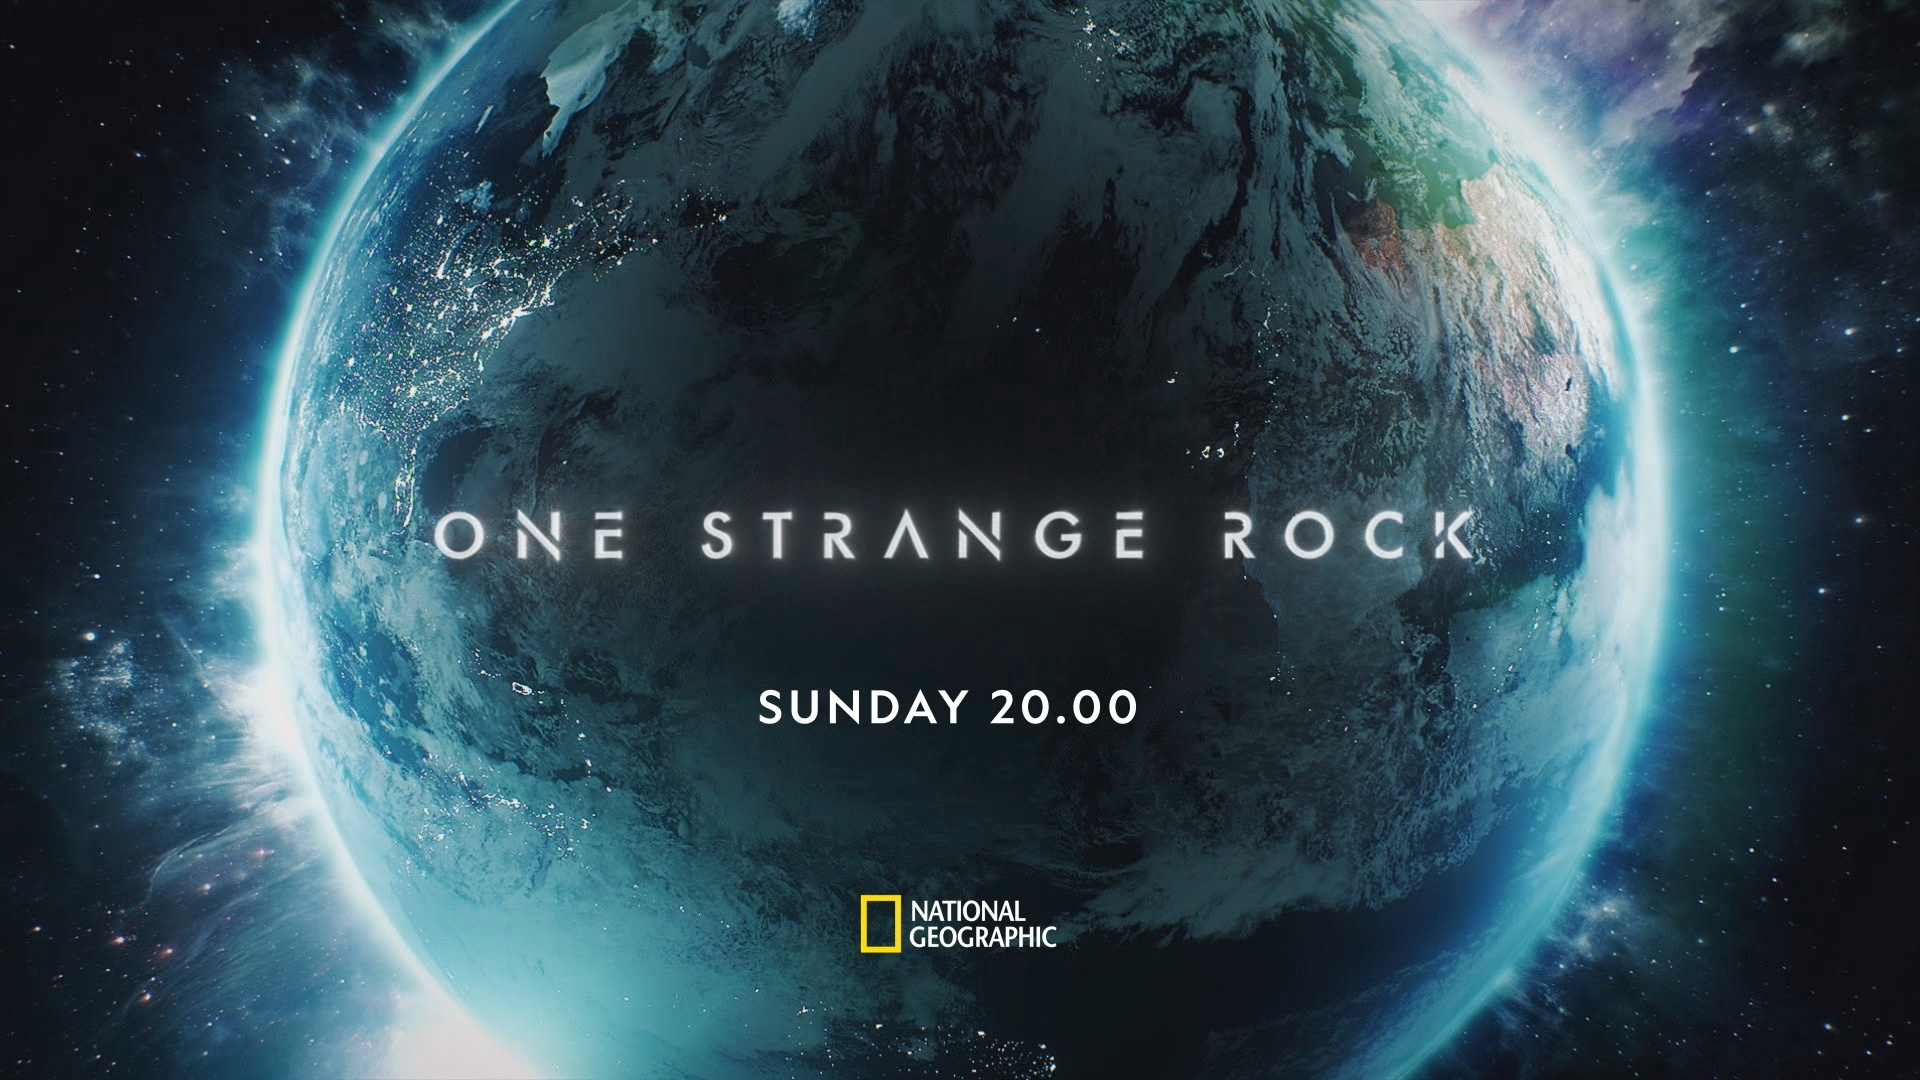 Thumbnail for ONE STRANGE ROCK BEETHOVEN PROMO